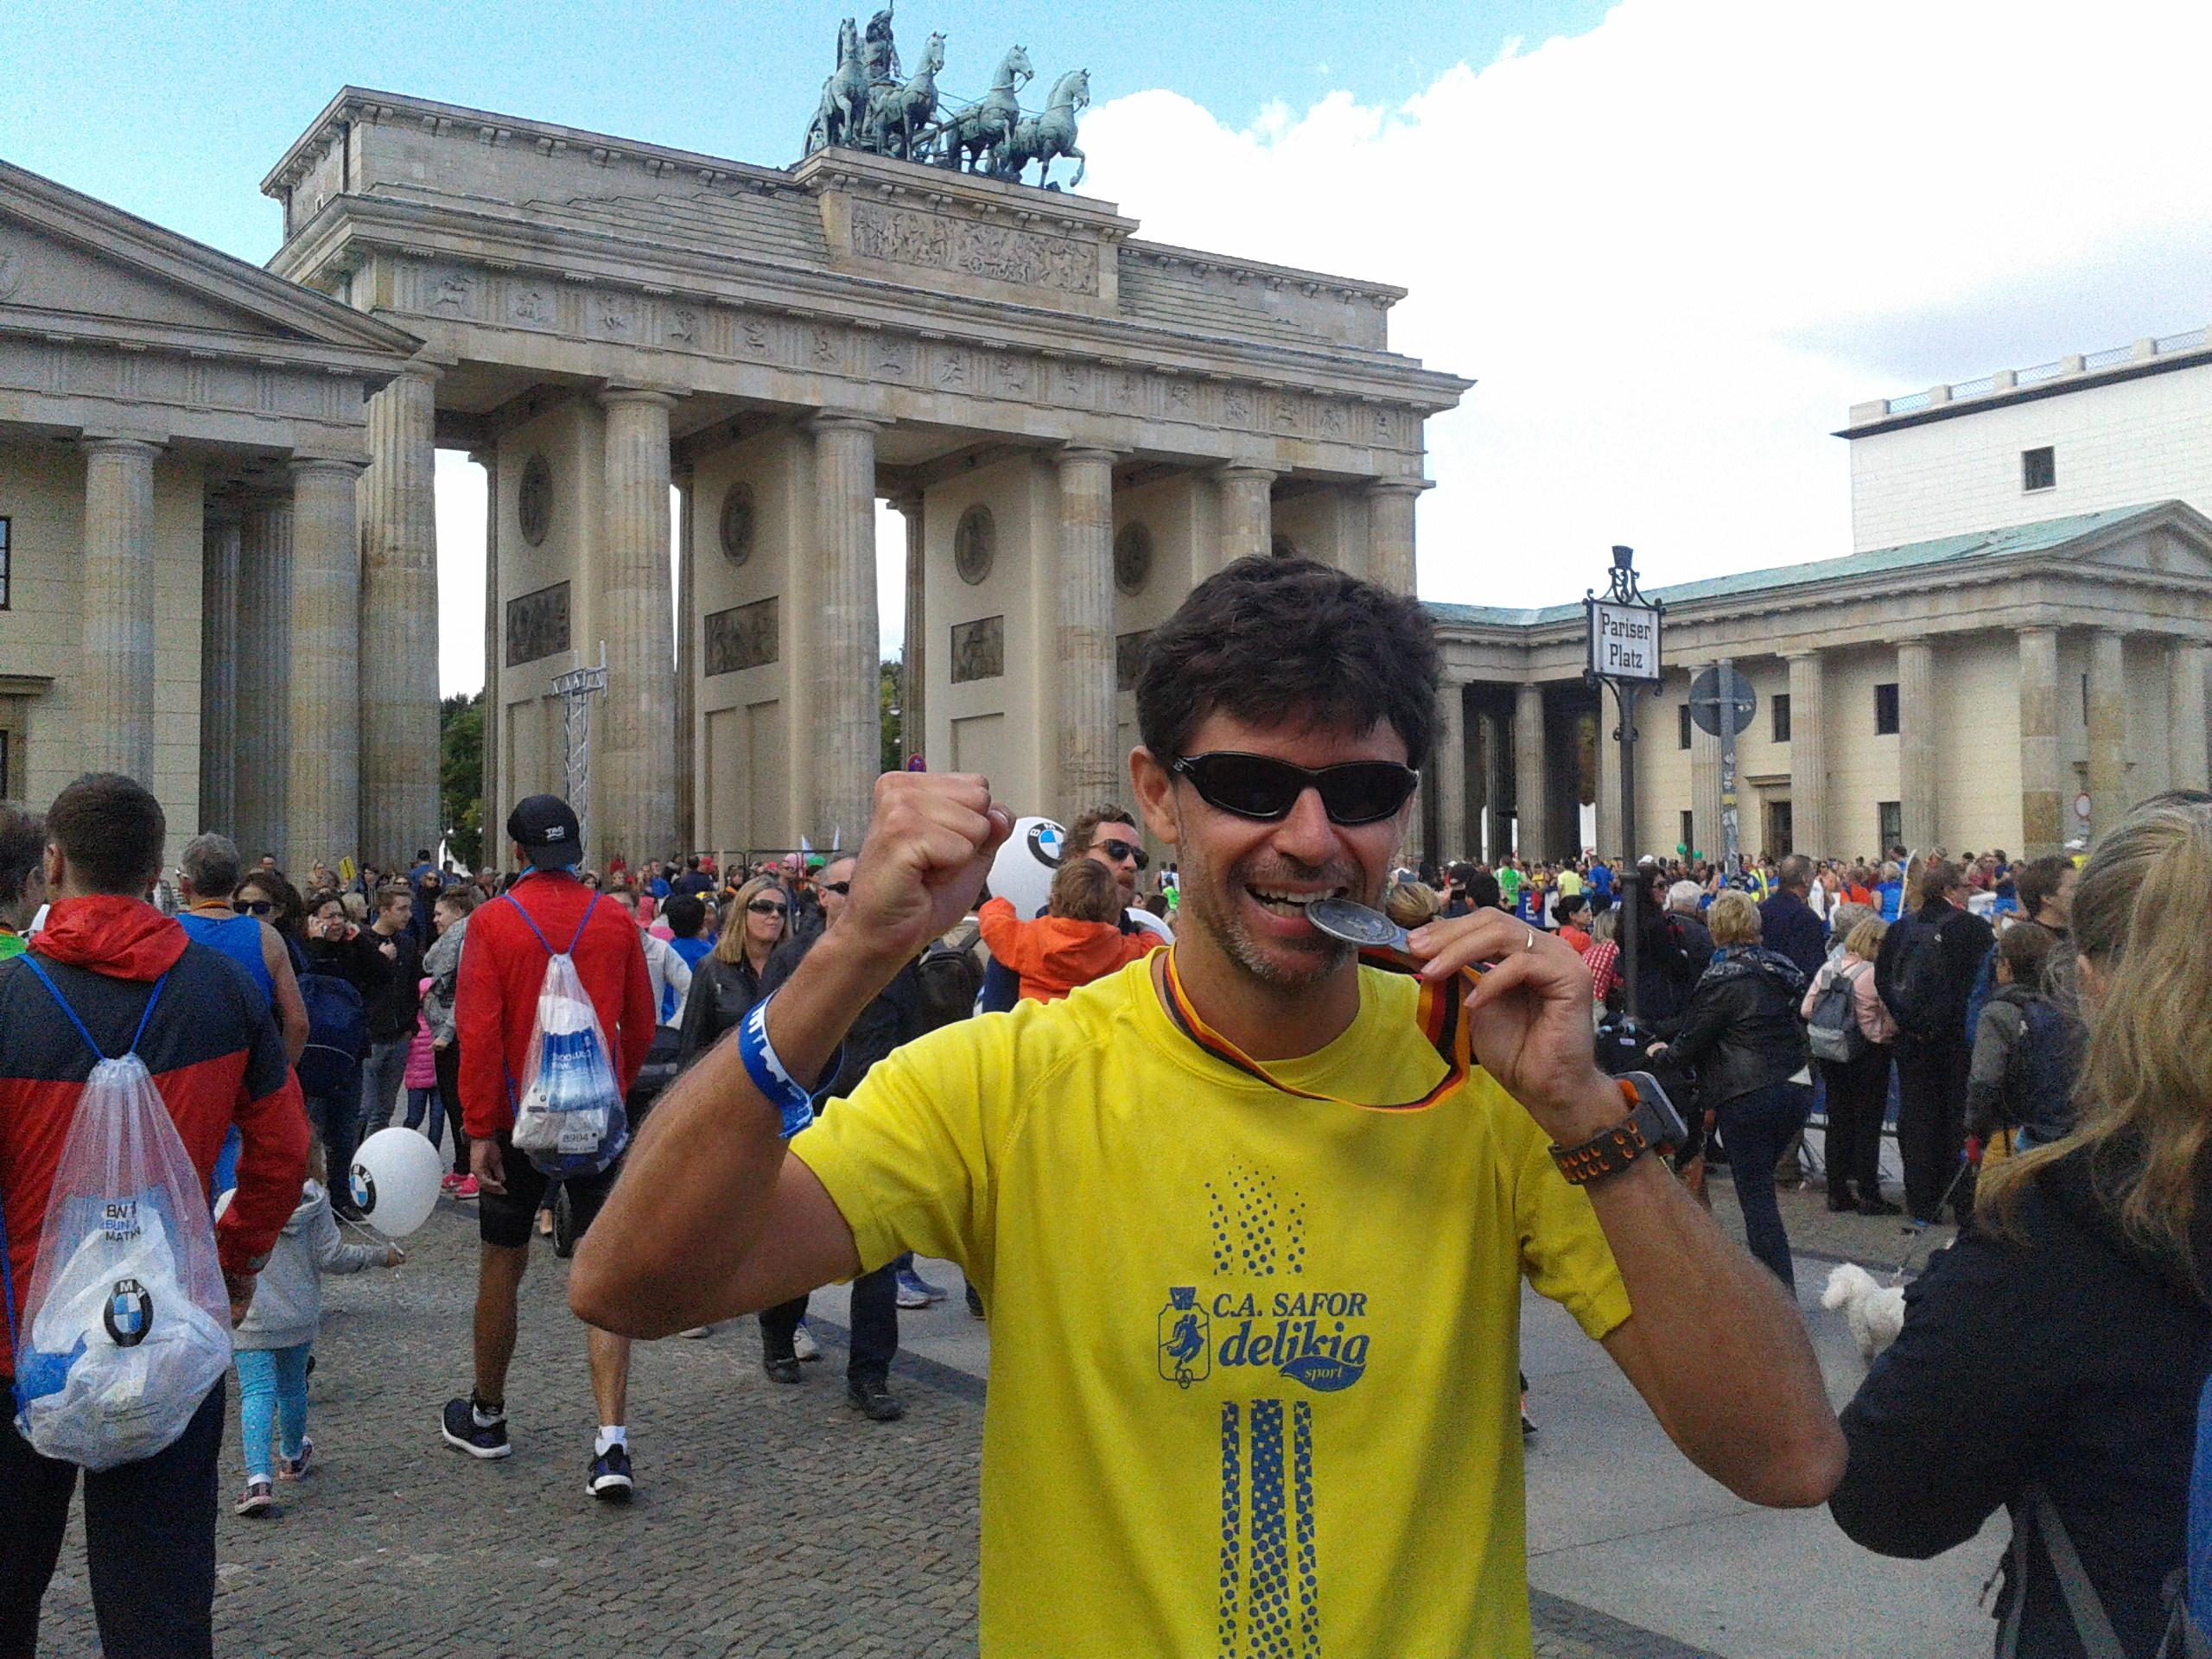 MARATÓN DE BERLIN 2015 (I) - RUBEN CAMARENA